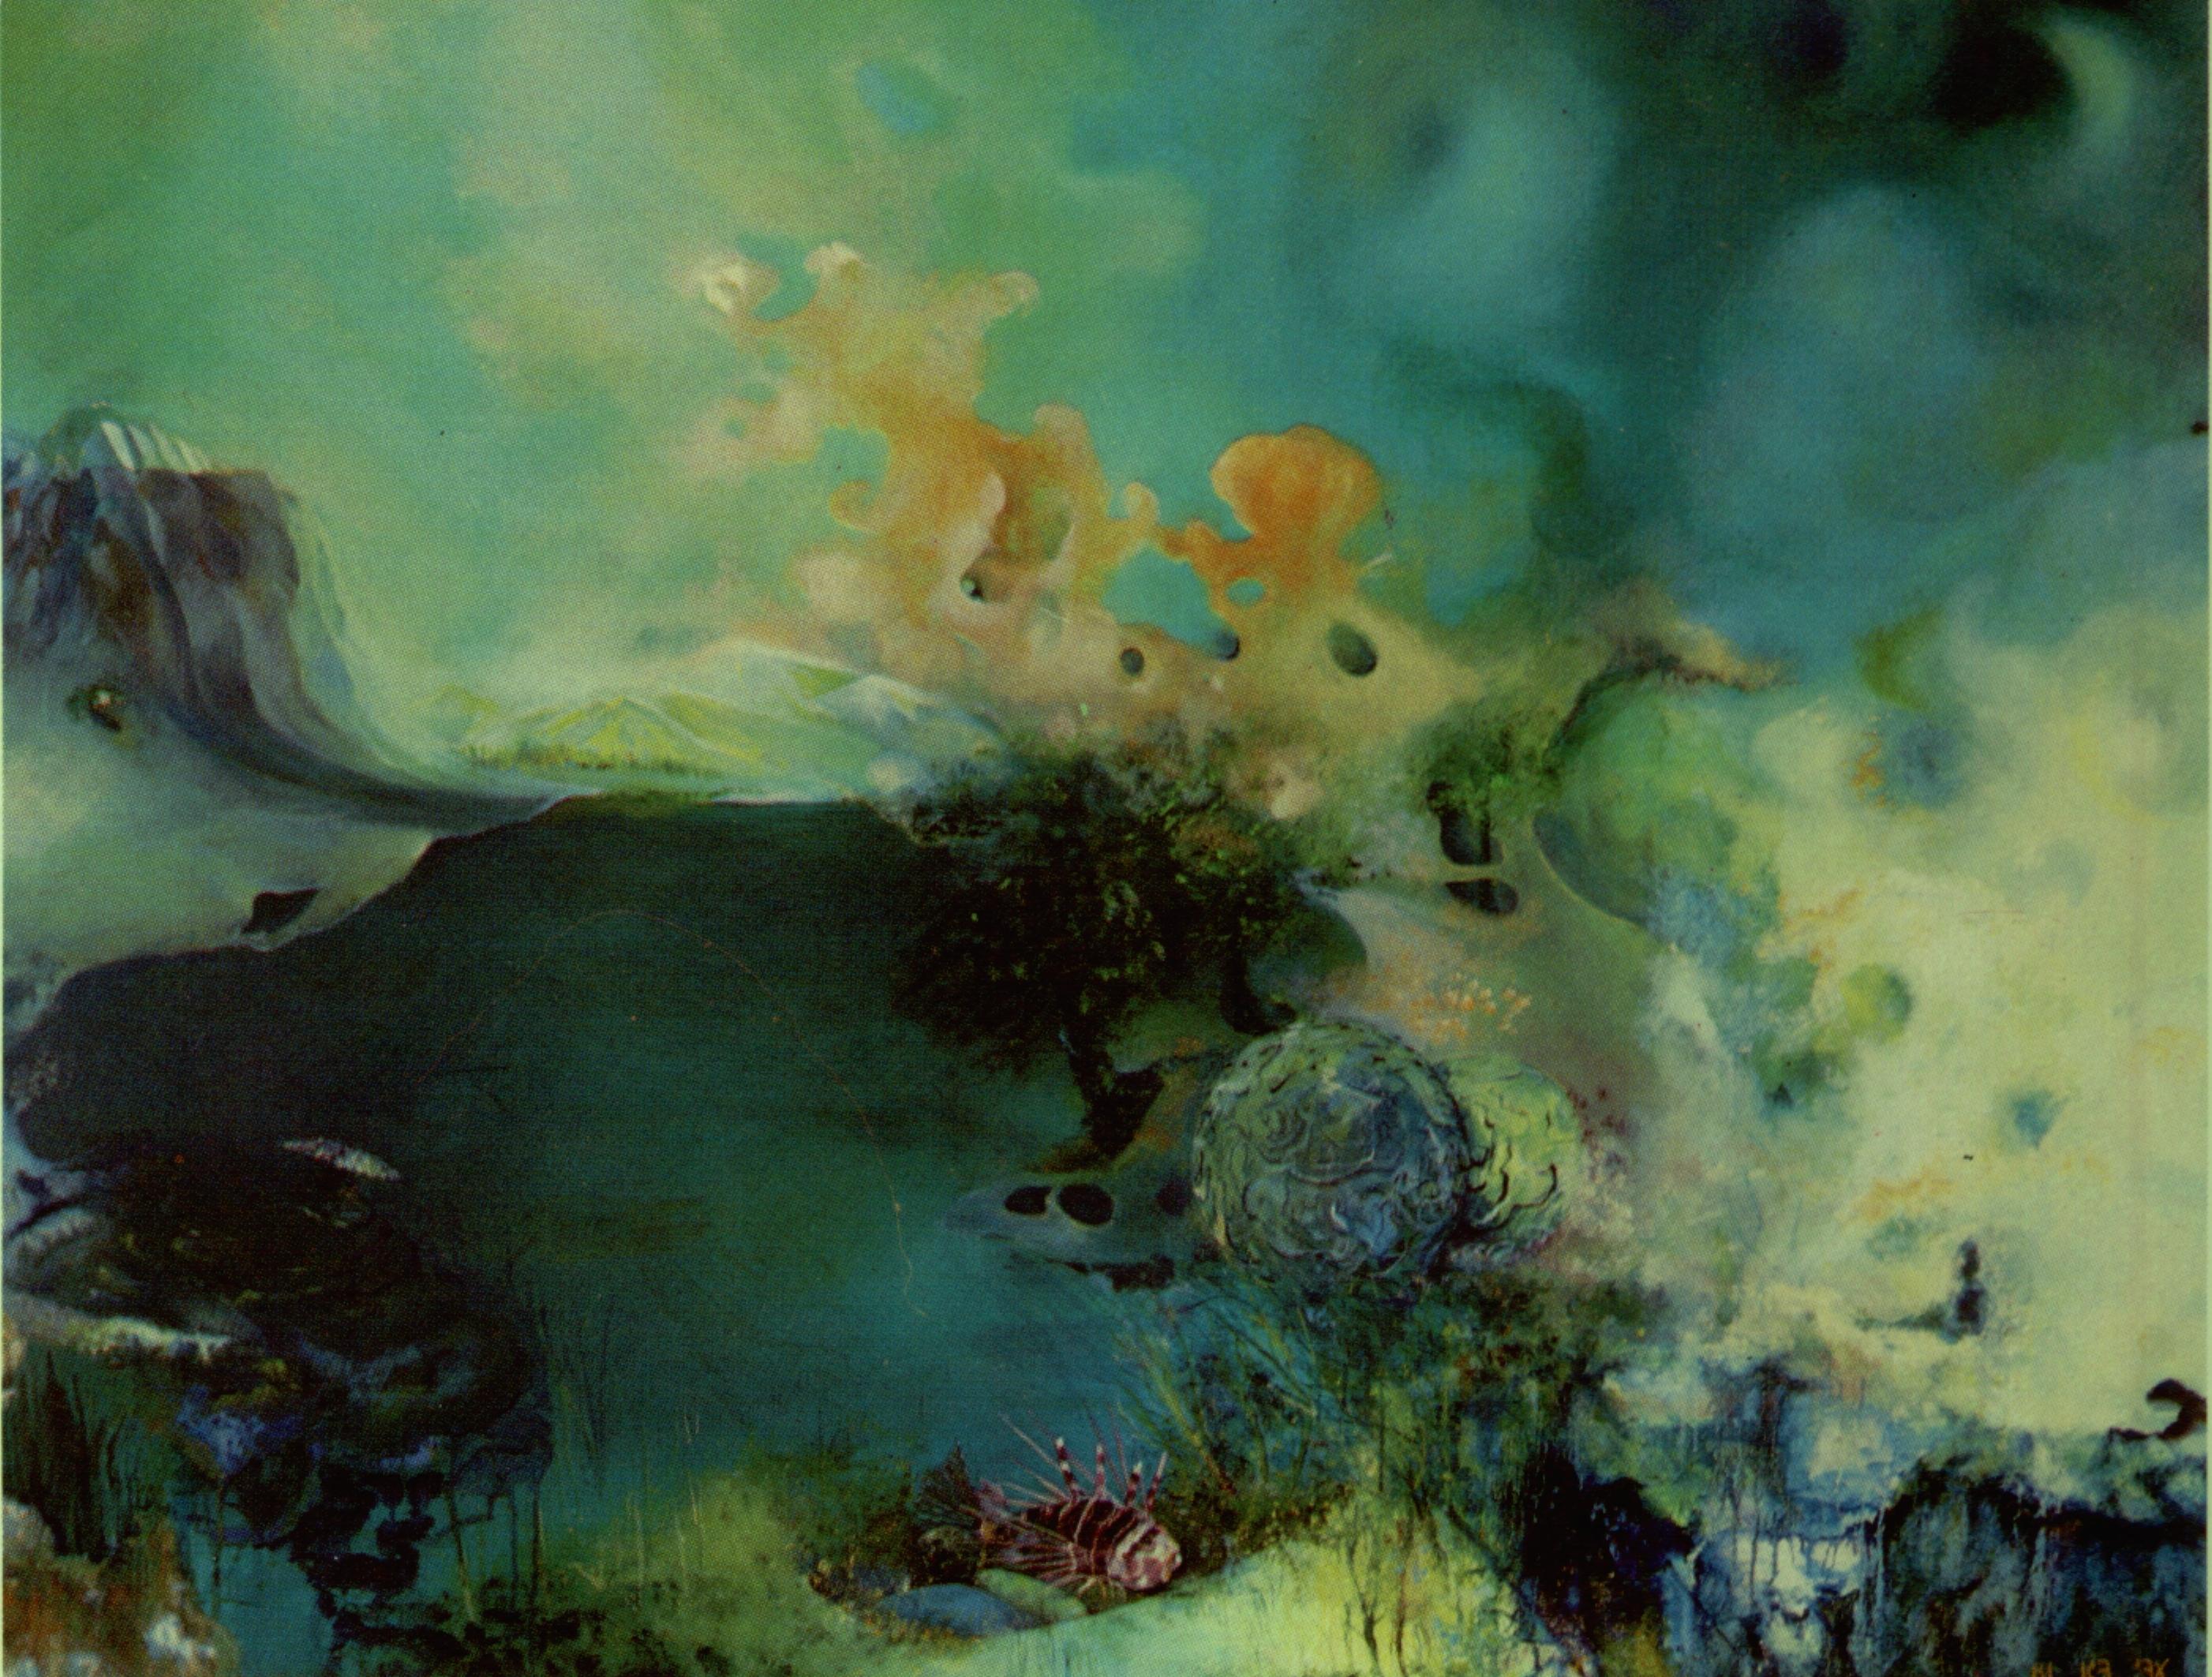 oil painting - eilat waterworld